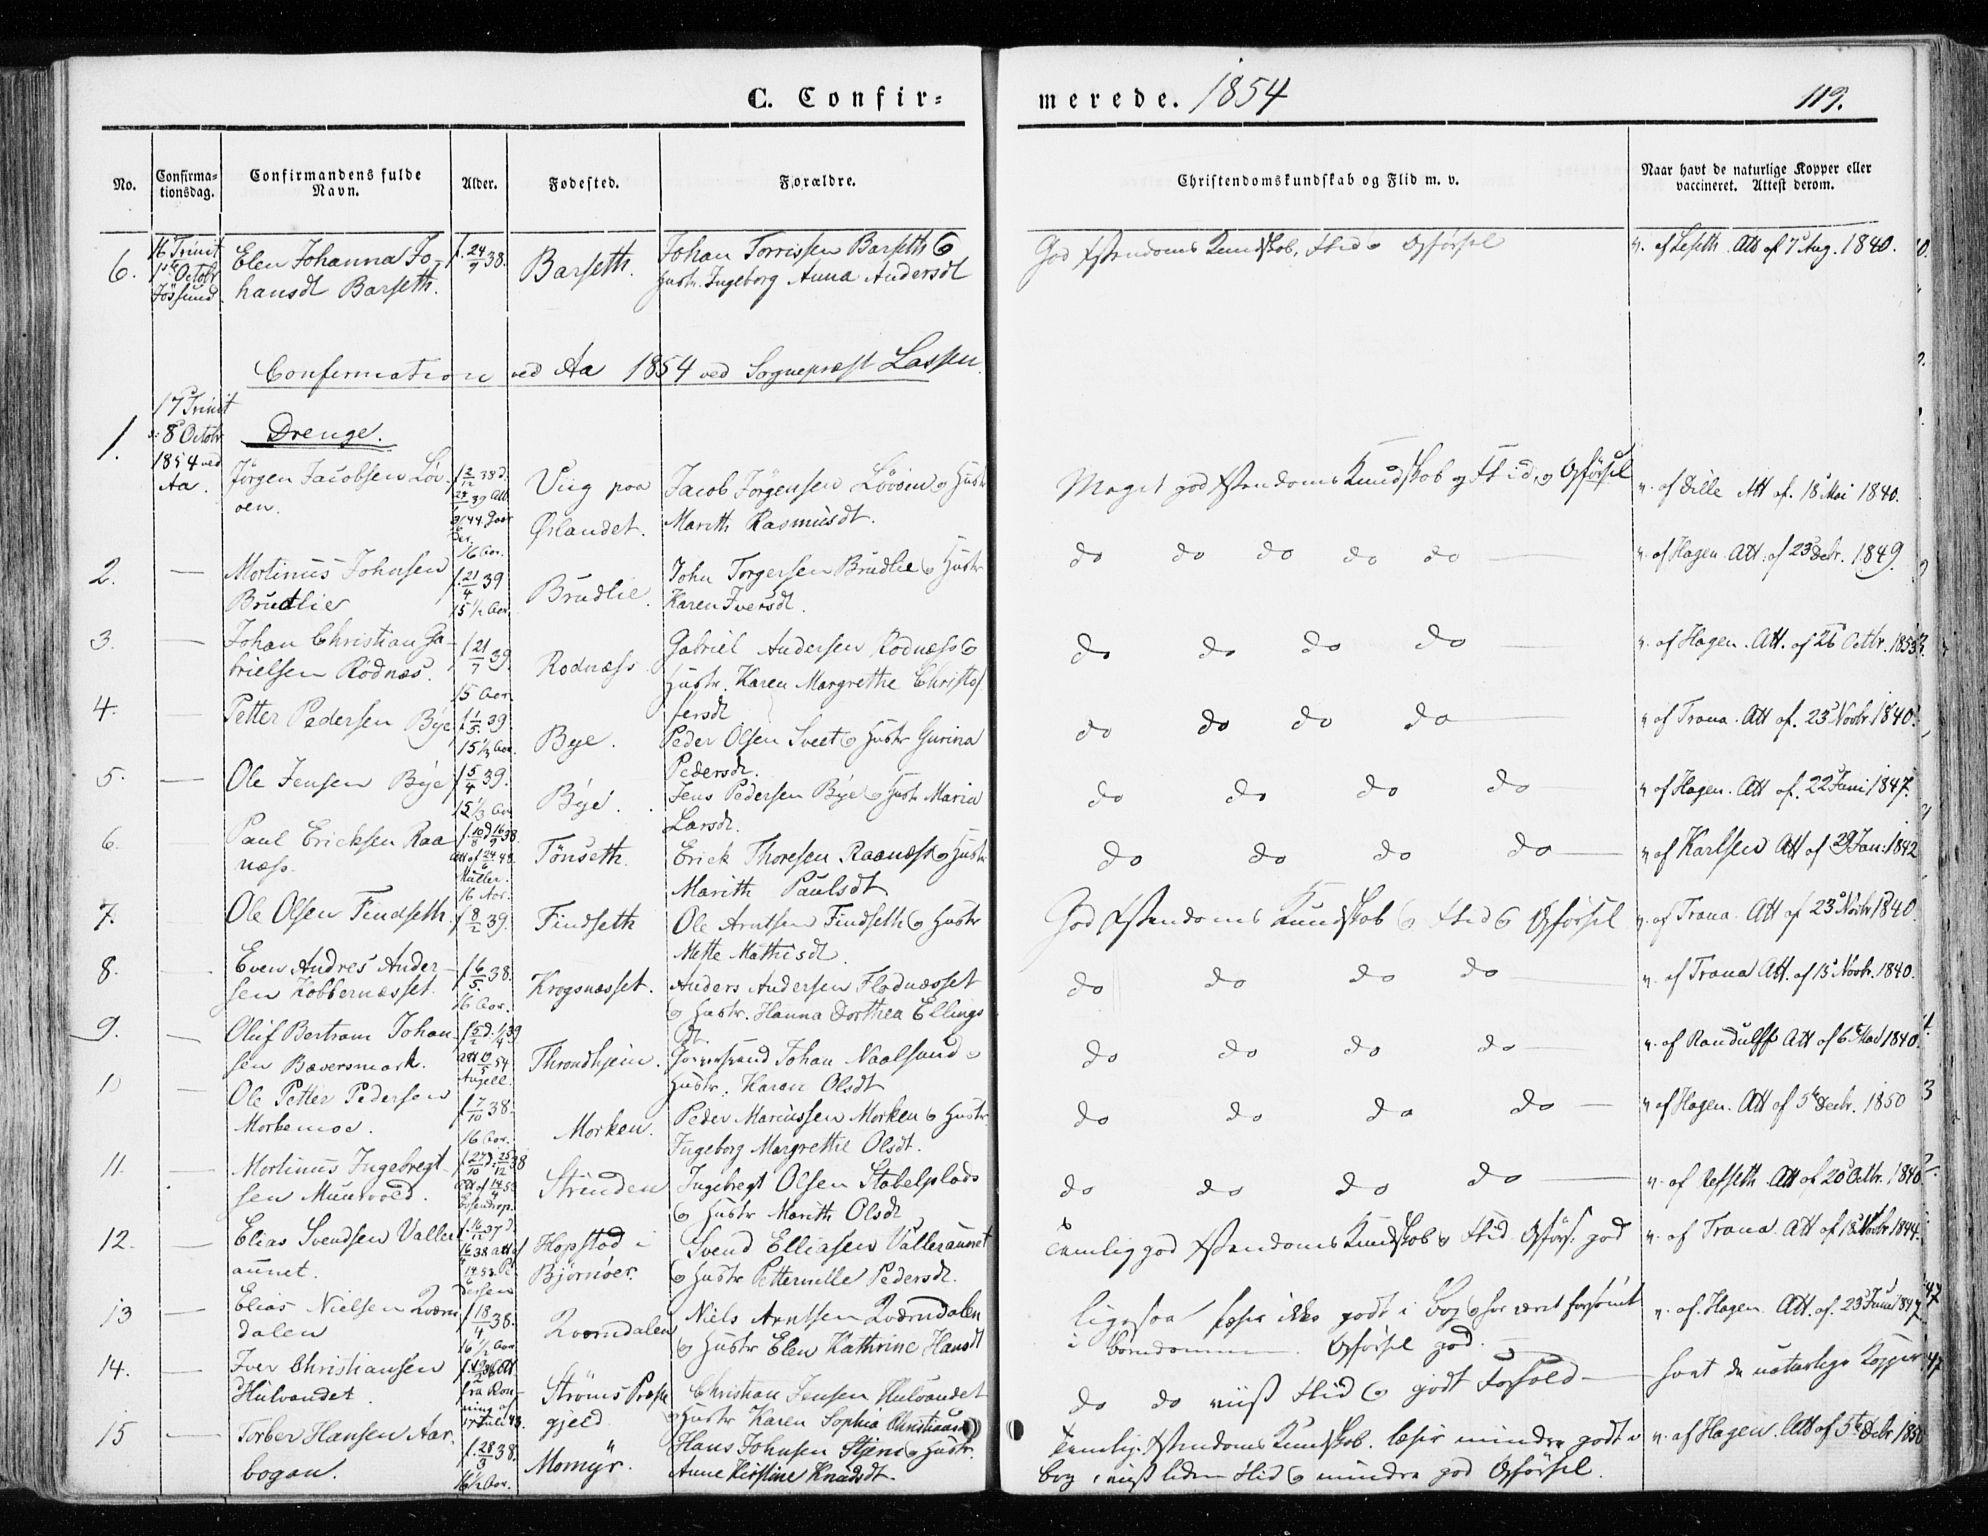 SAT, Ministerialprotokoller, klokkerbøker og fødselsregistre - Sør-Trøndelag, 655/L0677: Parish register (official) no. 655A06, 1847-1860, p. 119